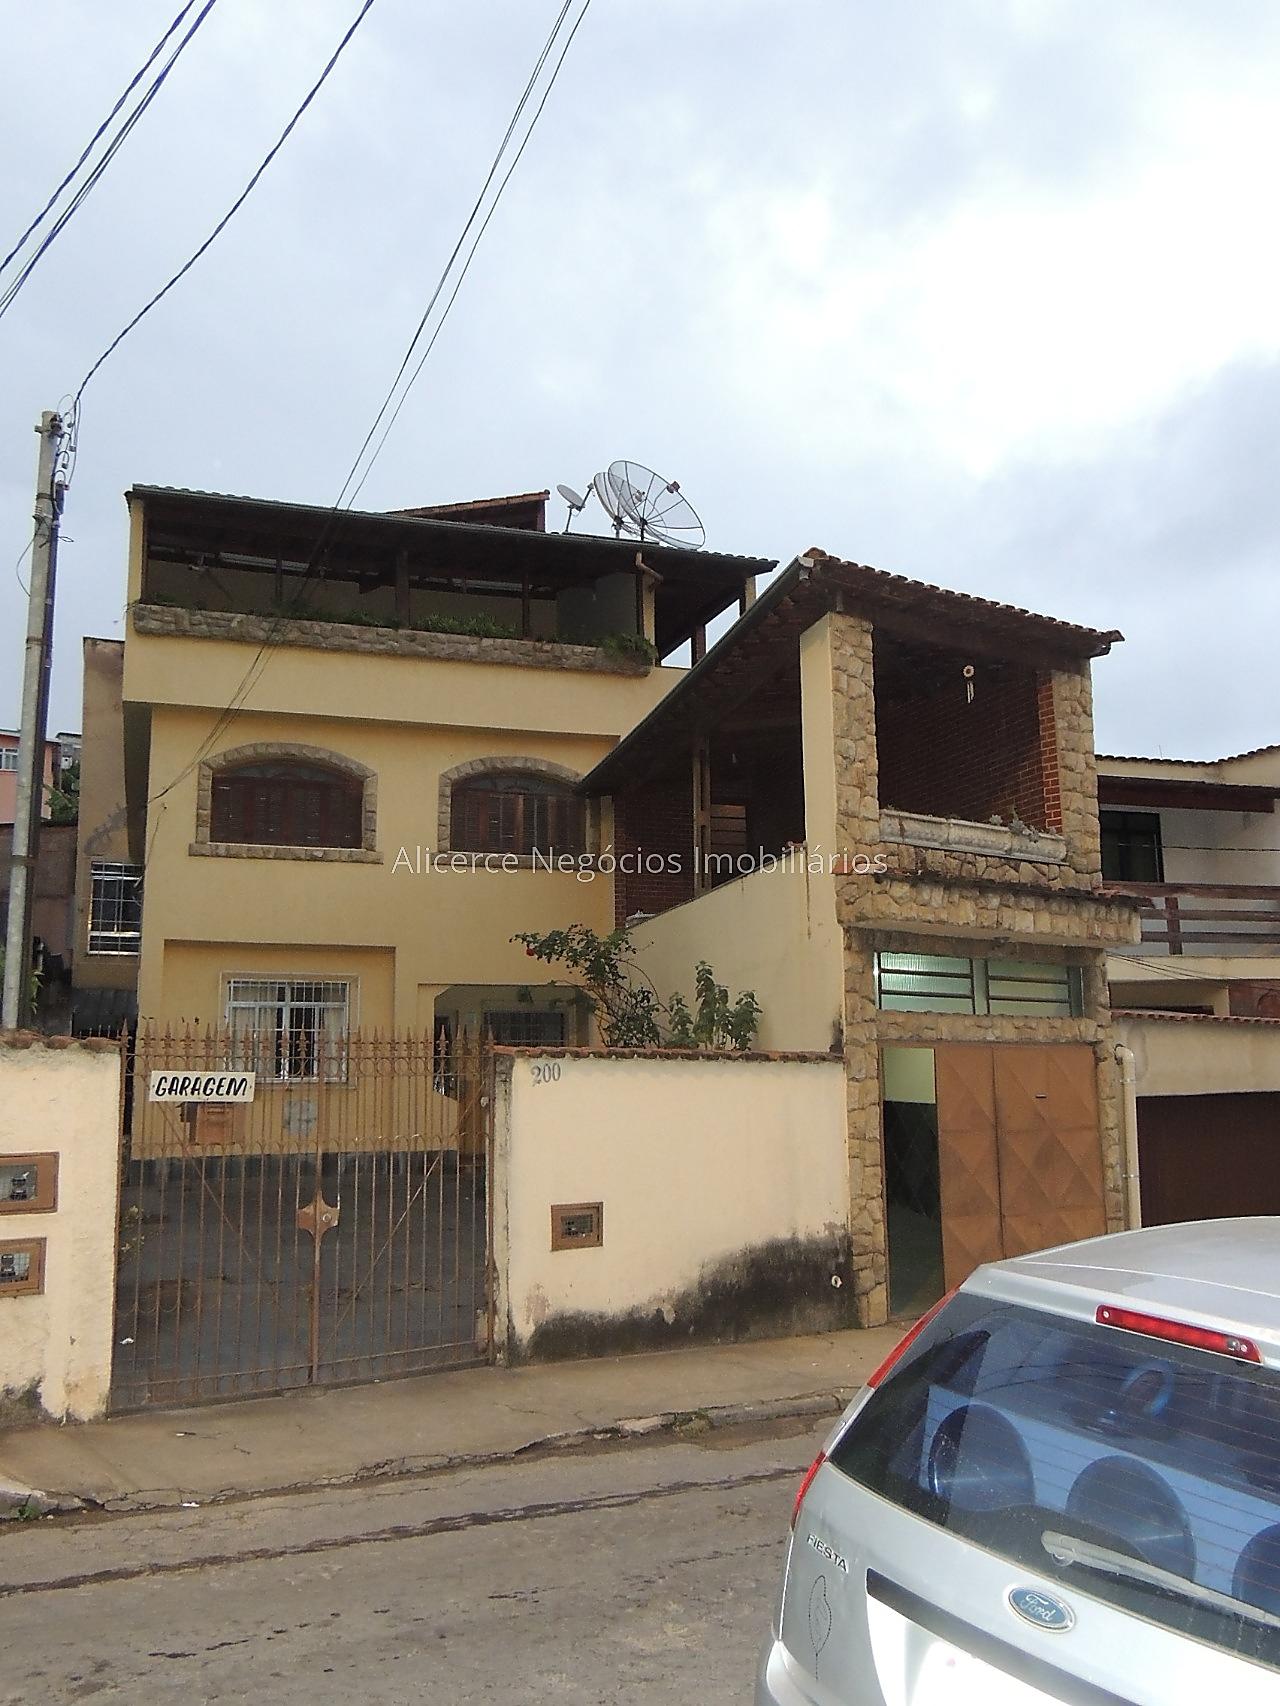 Ref.: 6048 - Casa 2 qtos - Vitorino Braga